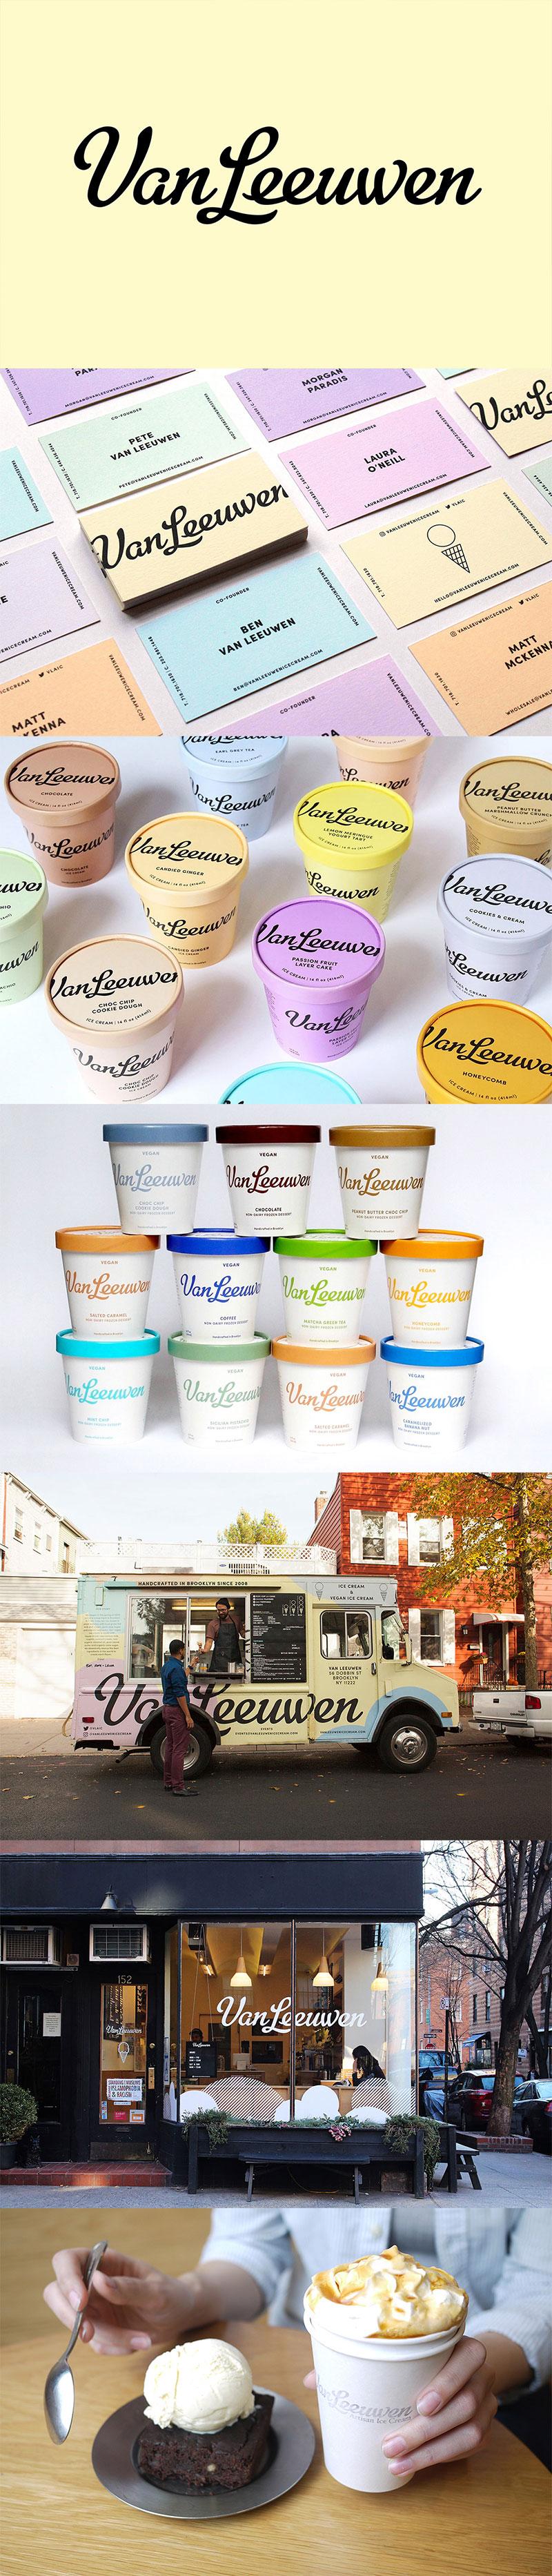 Ice Cream Packaging - Van Leeuwen Artisan Ice Cream